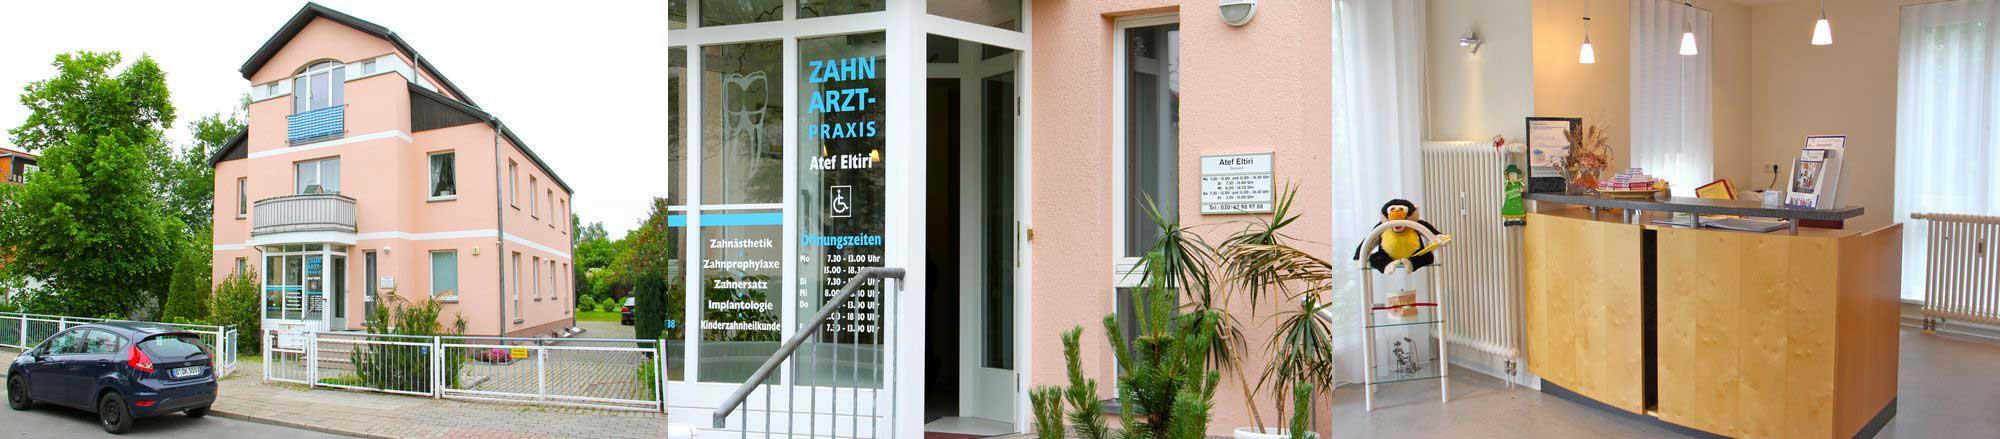 Zahnarztpraxis Eltiri, Bernulfstraße in Berlin